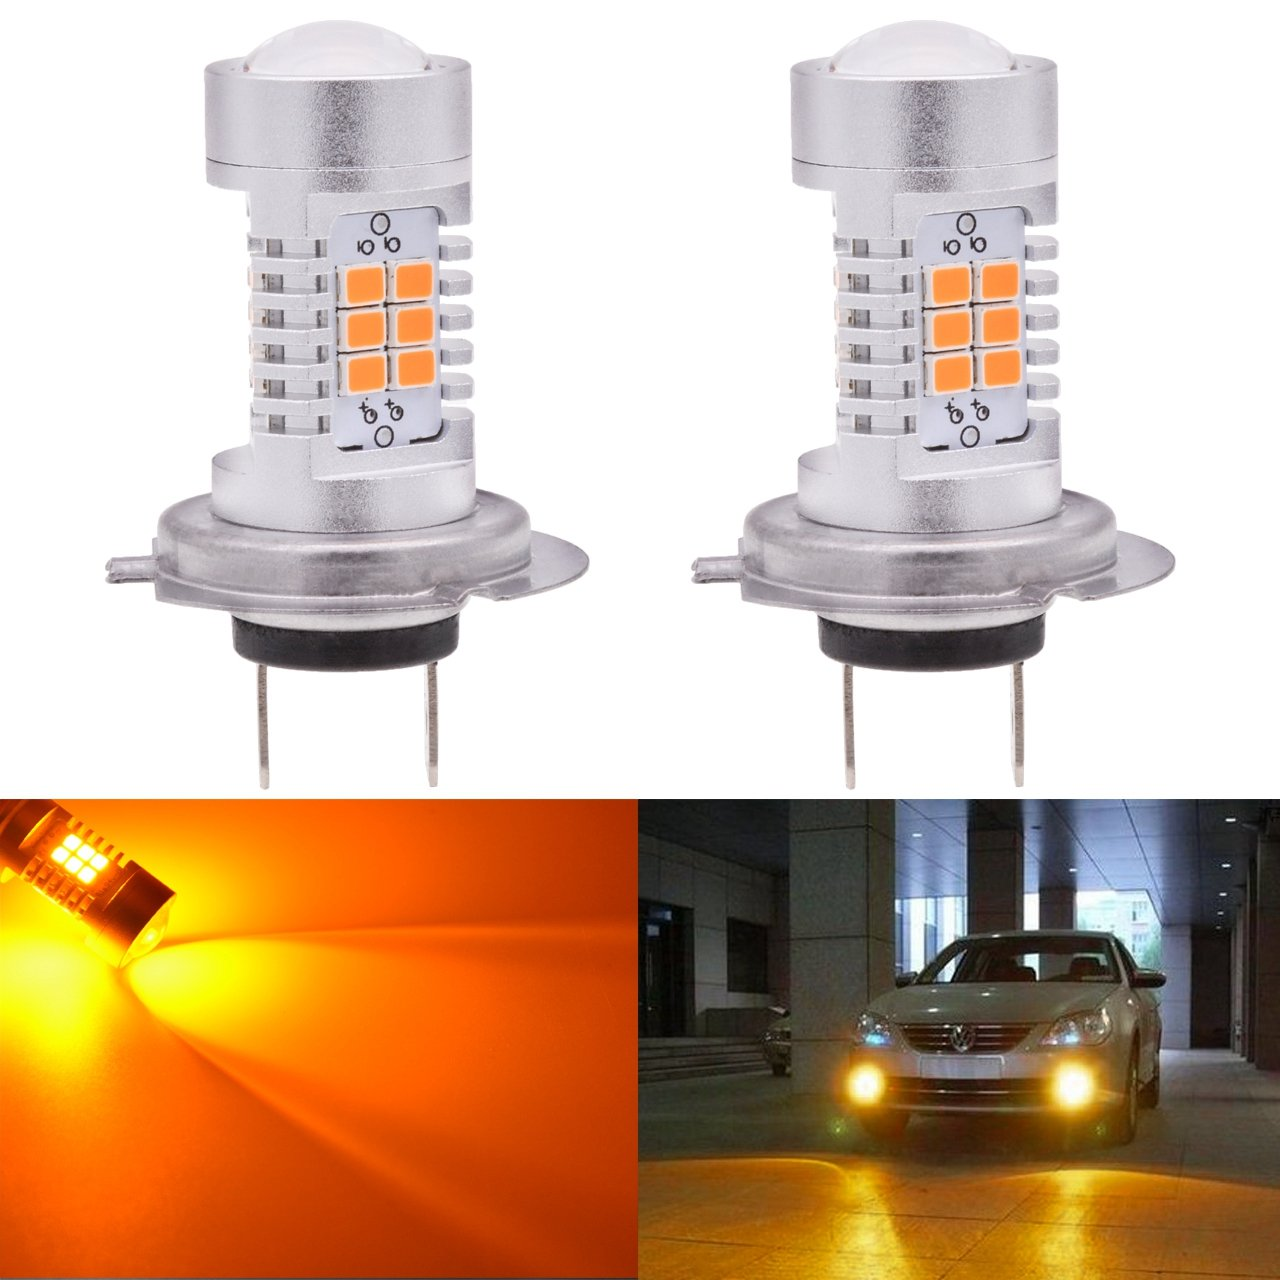 KATUR H7 LED Fog Light Bulbs Max 80W High Power Super Bright 2000 Lumens 3000K Amber with Projector for Driving Daytime Running Lights DRL or Fog Lights,12V -24V (Pack of 2)